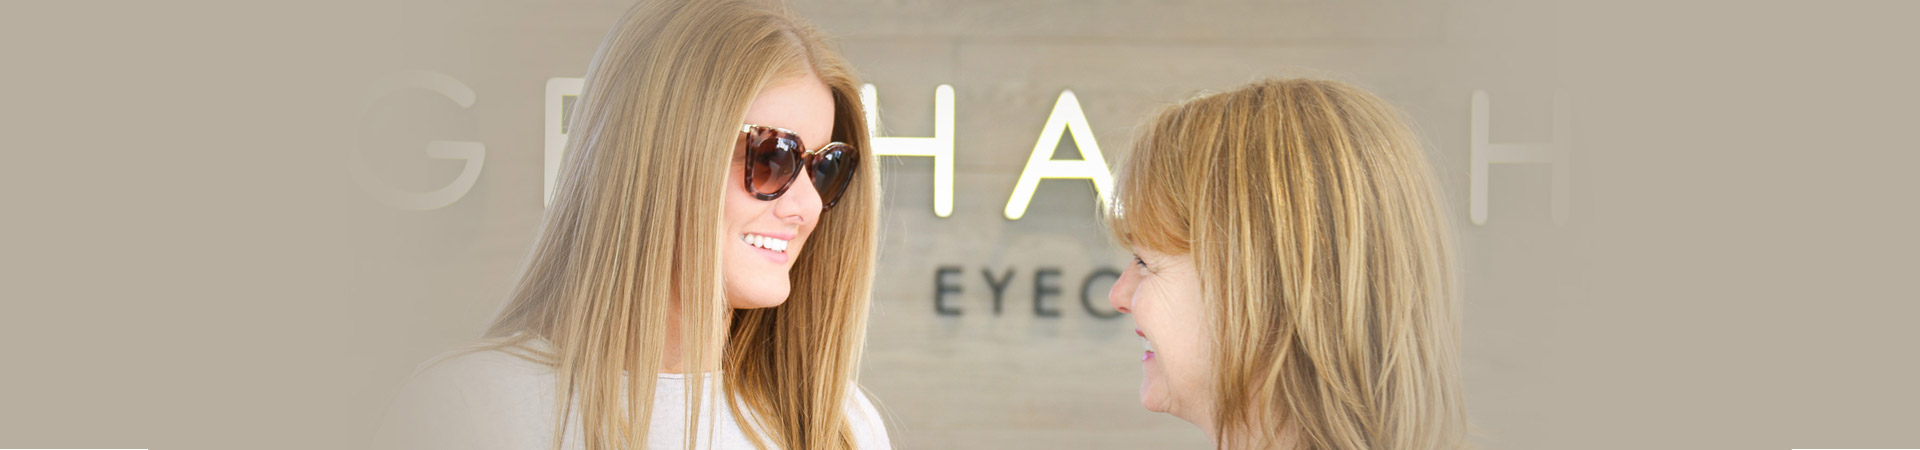 Why Choose Us - Graham Hill Eyecare